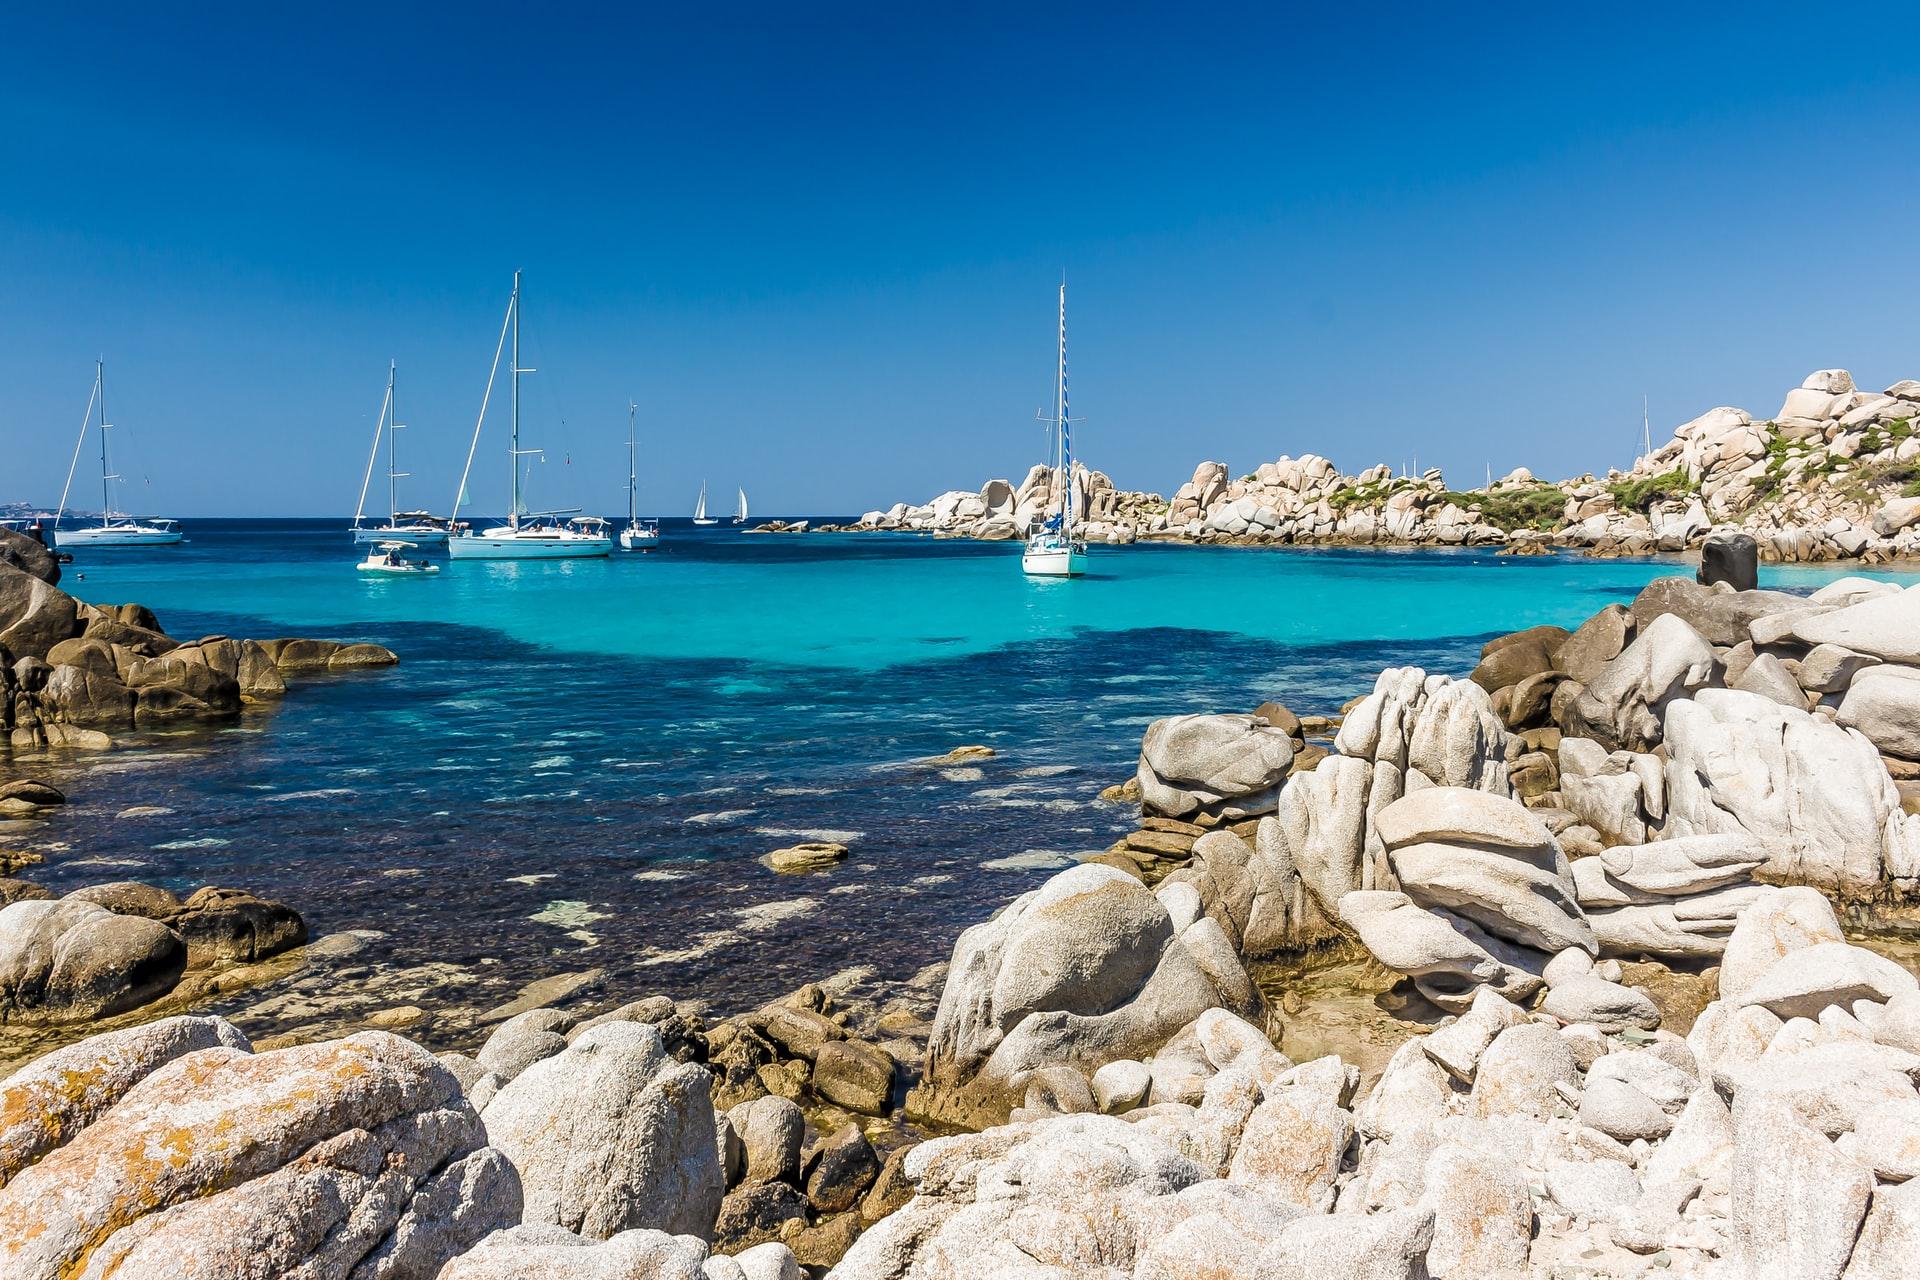 Toutes vos envies en Corse